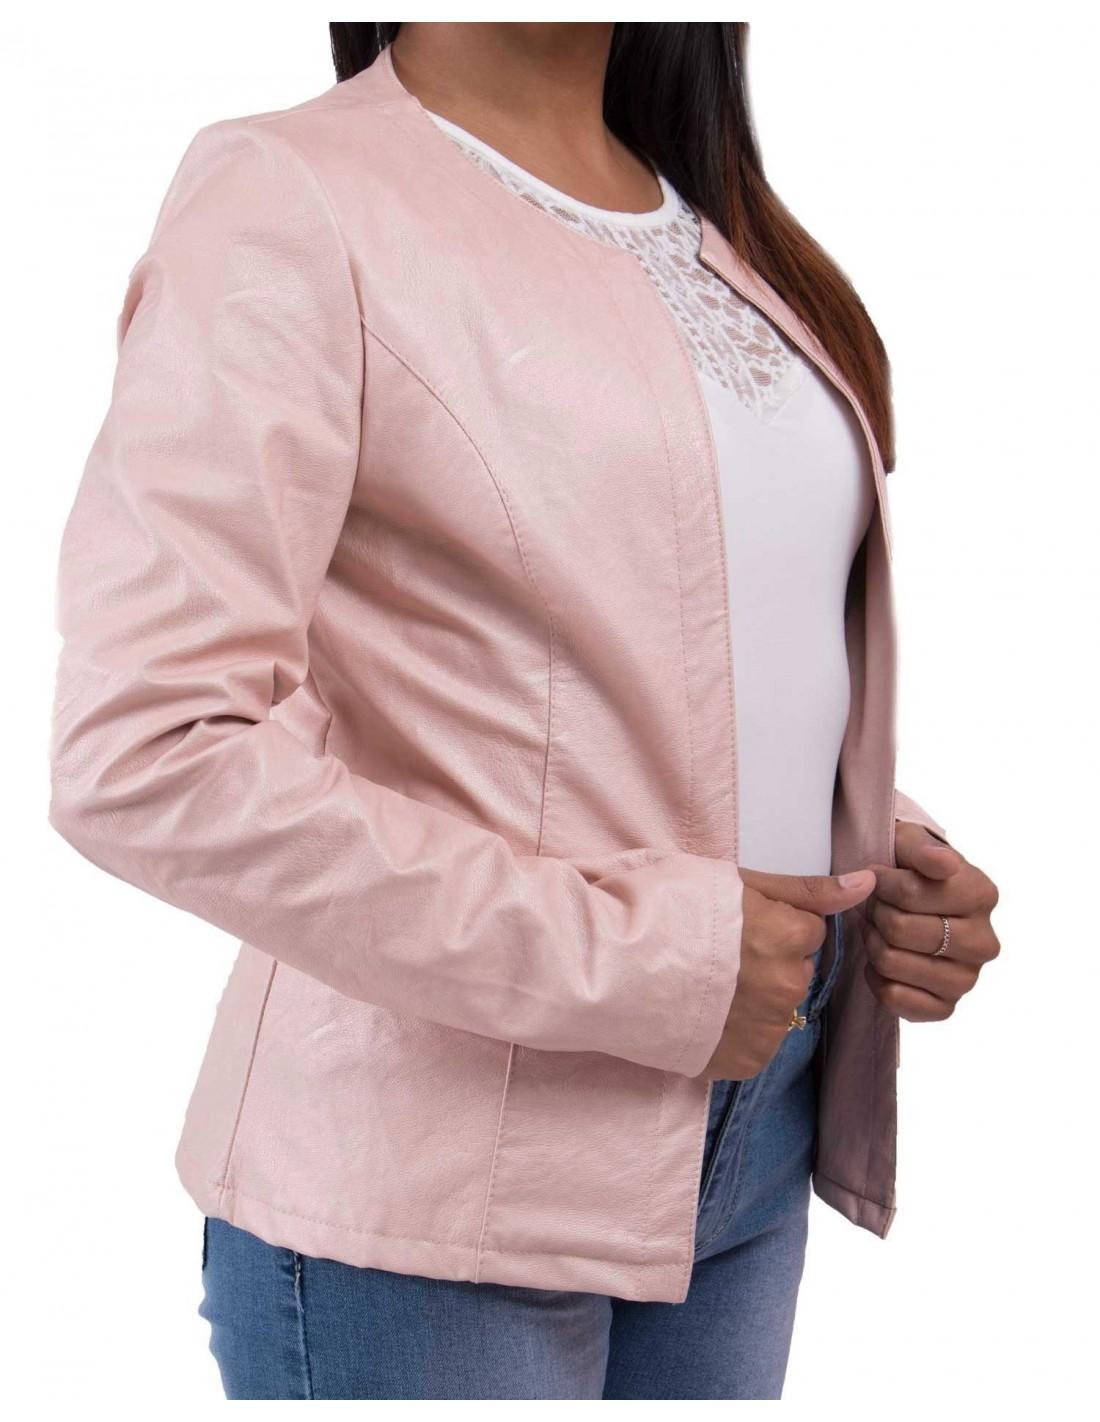 blouson simili cuir rose femme les vestes la mode sont. Black Bedroom Furniture Sets. Home Design Ideas